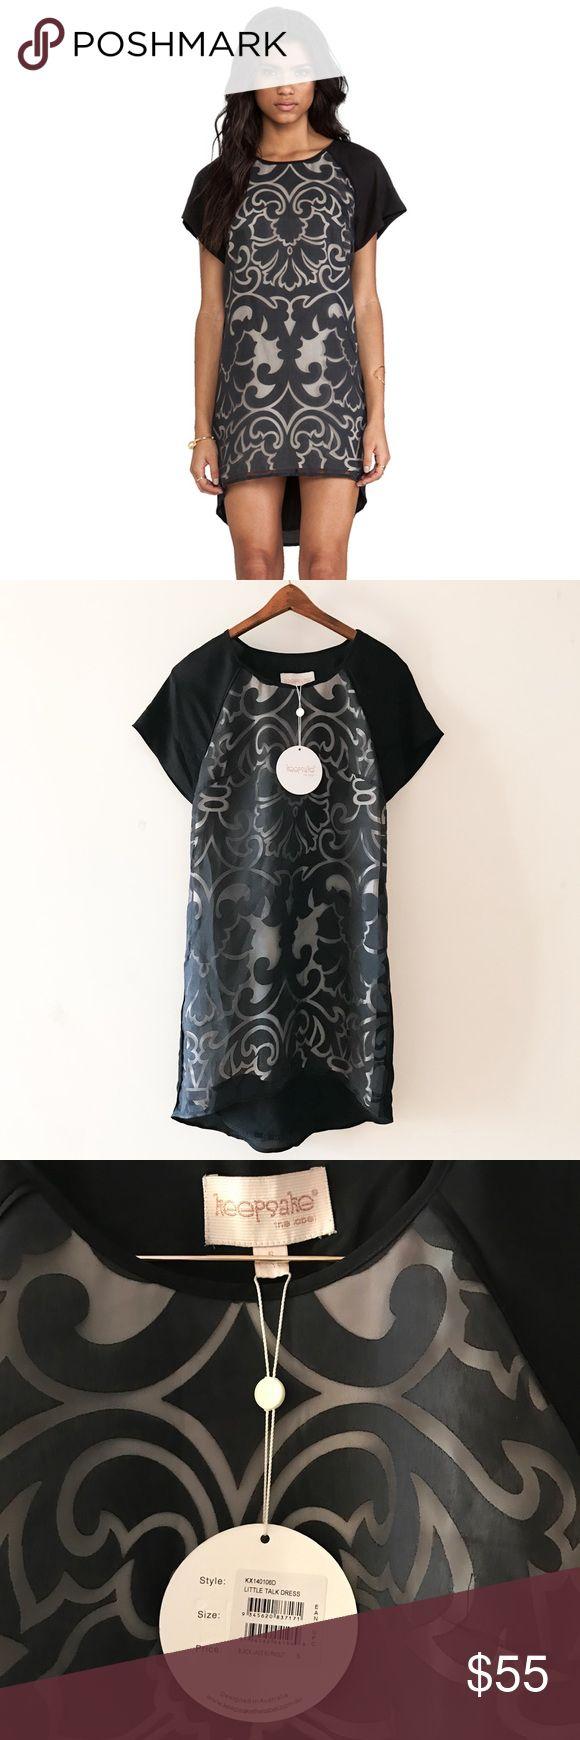 "Keepsake from ASOS black lace burnout dress small Gorgeous Keepsake dress in black lace burnout size small, approximately 32"" long ASOS Dresses Mini"